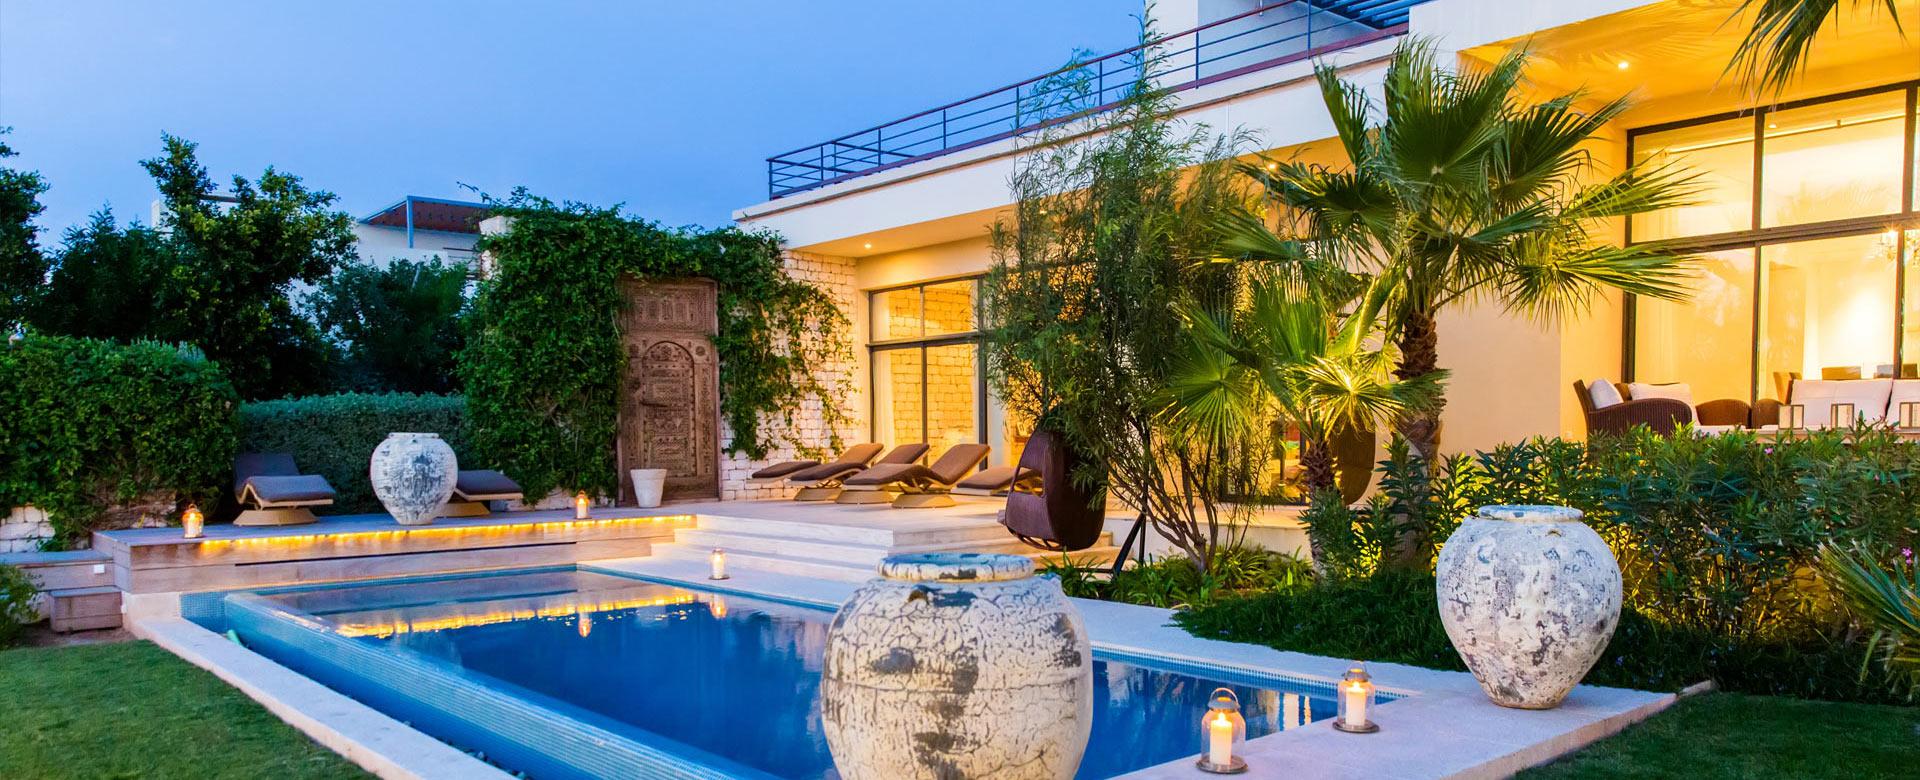 Luxury villa rentals in essaouira villanovo - Les jardins de villa maroc essaouira ...